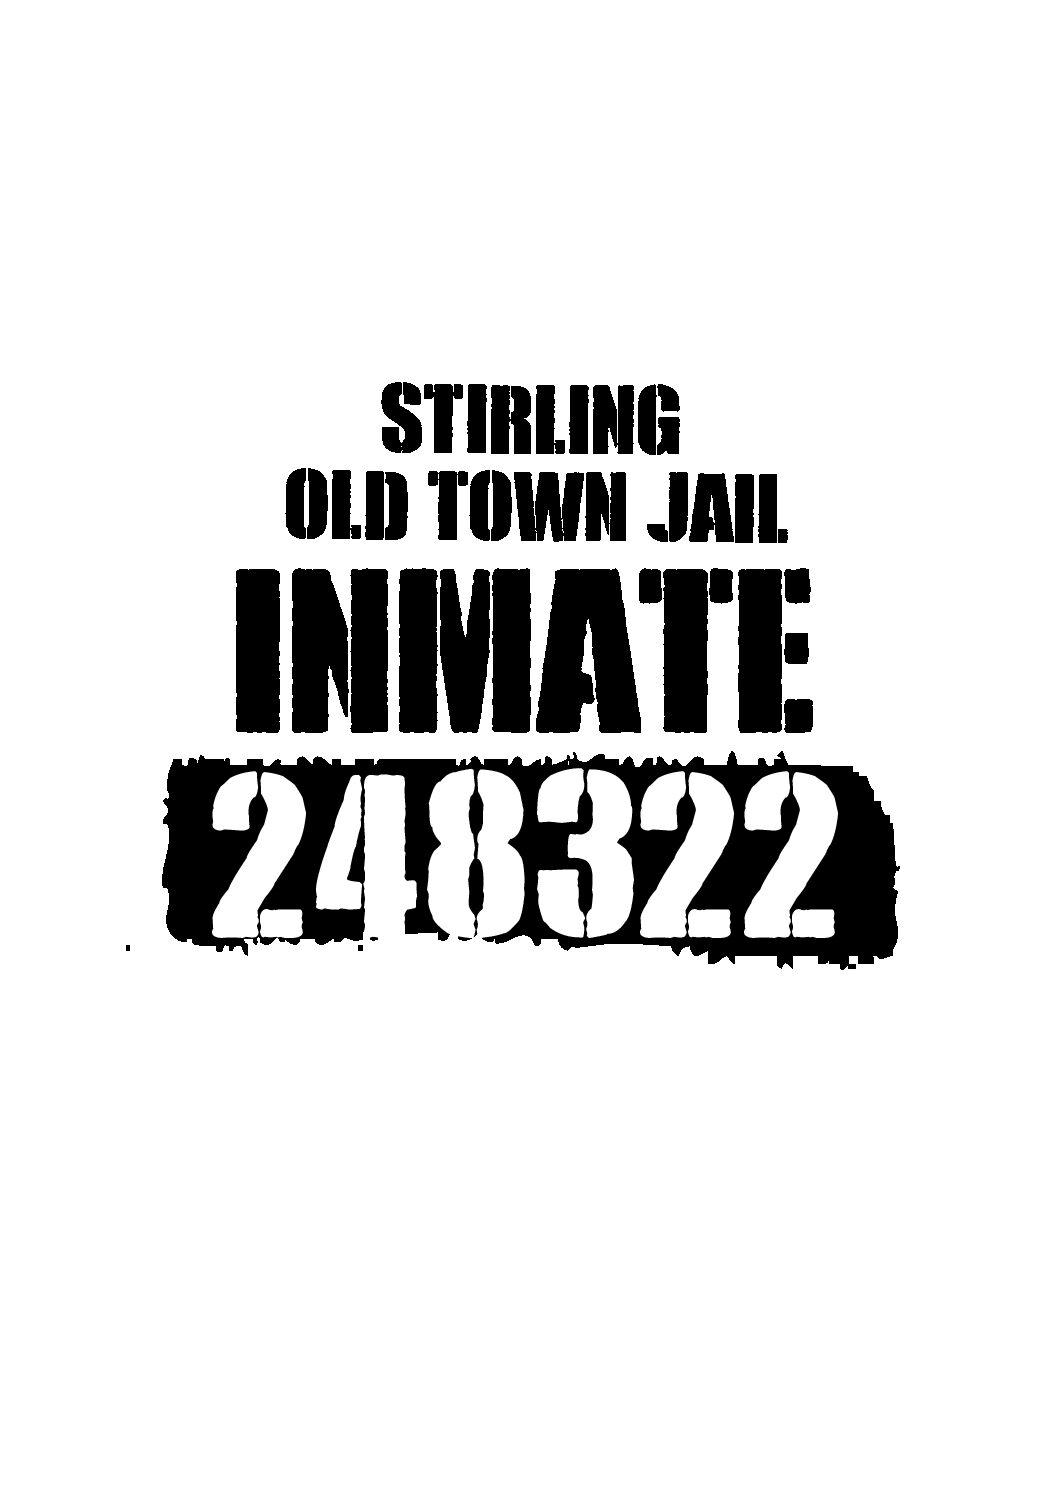 https://oldtownjail.co.uk/wp-content/uploads/2021/03/Inmate-Number-Tee-pdf.jpg